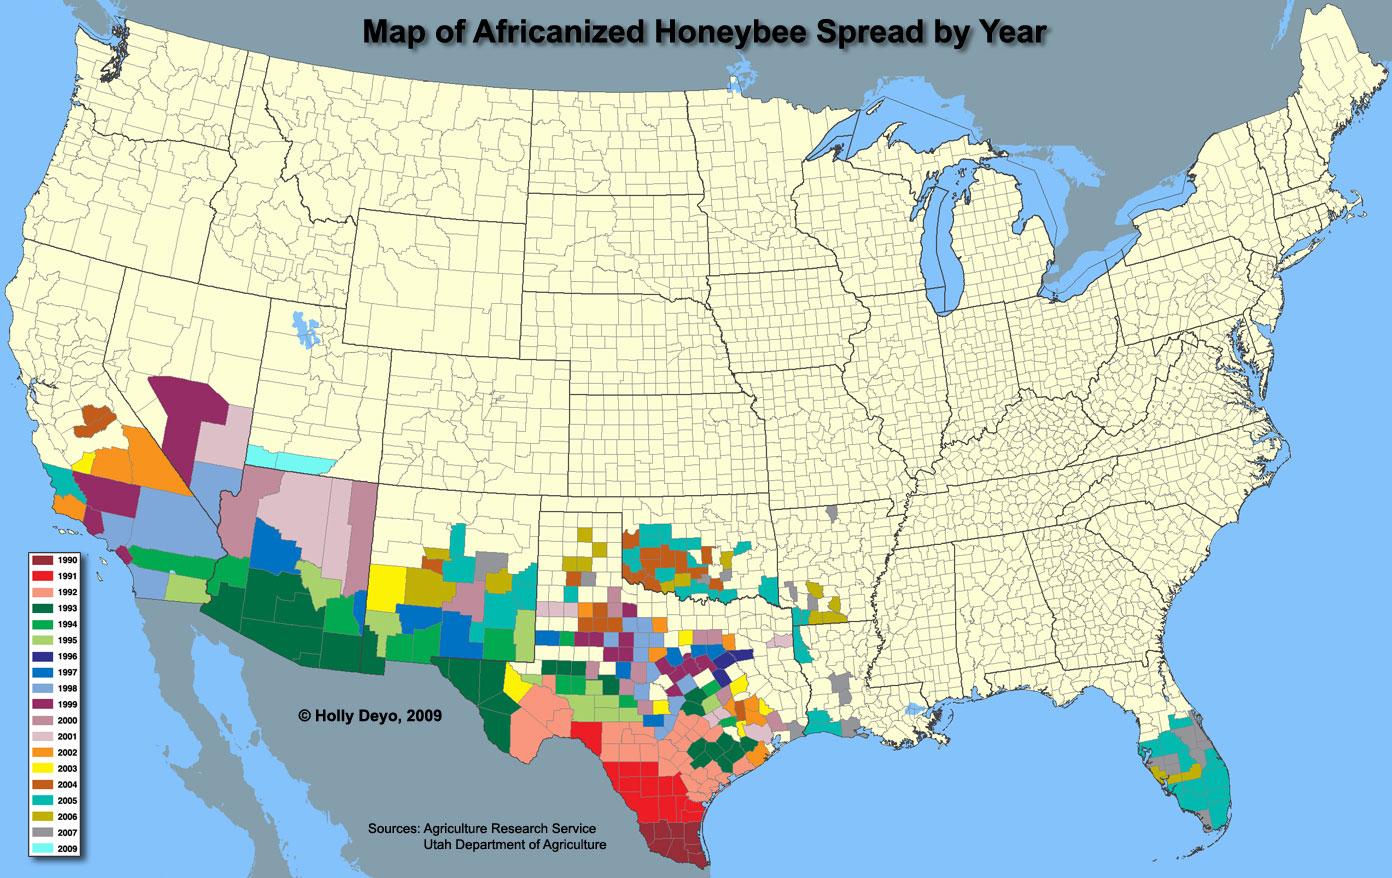 Millennium Ark: Hot News on killer bees in new jersey, killer bee map 2014, killer bees in california, killer bees in new mexico, killer bees in arizona, killer bees in america, killer bees in japan, killer bees in utah, killer bees in united states, killer bees in kansas, killer bees in michigan, fire ants in usa map, hurricanes in usa map, killer bees in florida, killer bees in oregon, africanized bees map, killer bees in wisconsin, killer bees in china, killer bee migration map, killer bees in alabama,